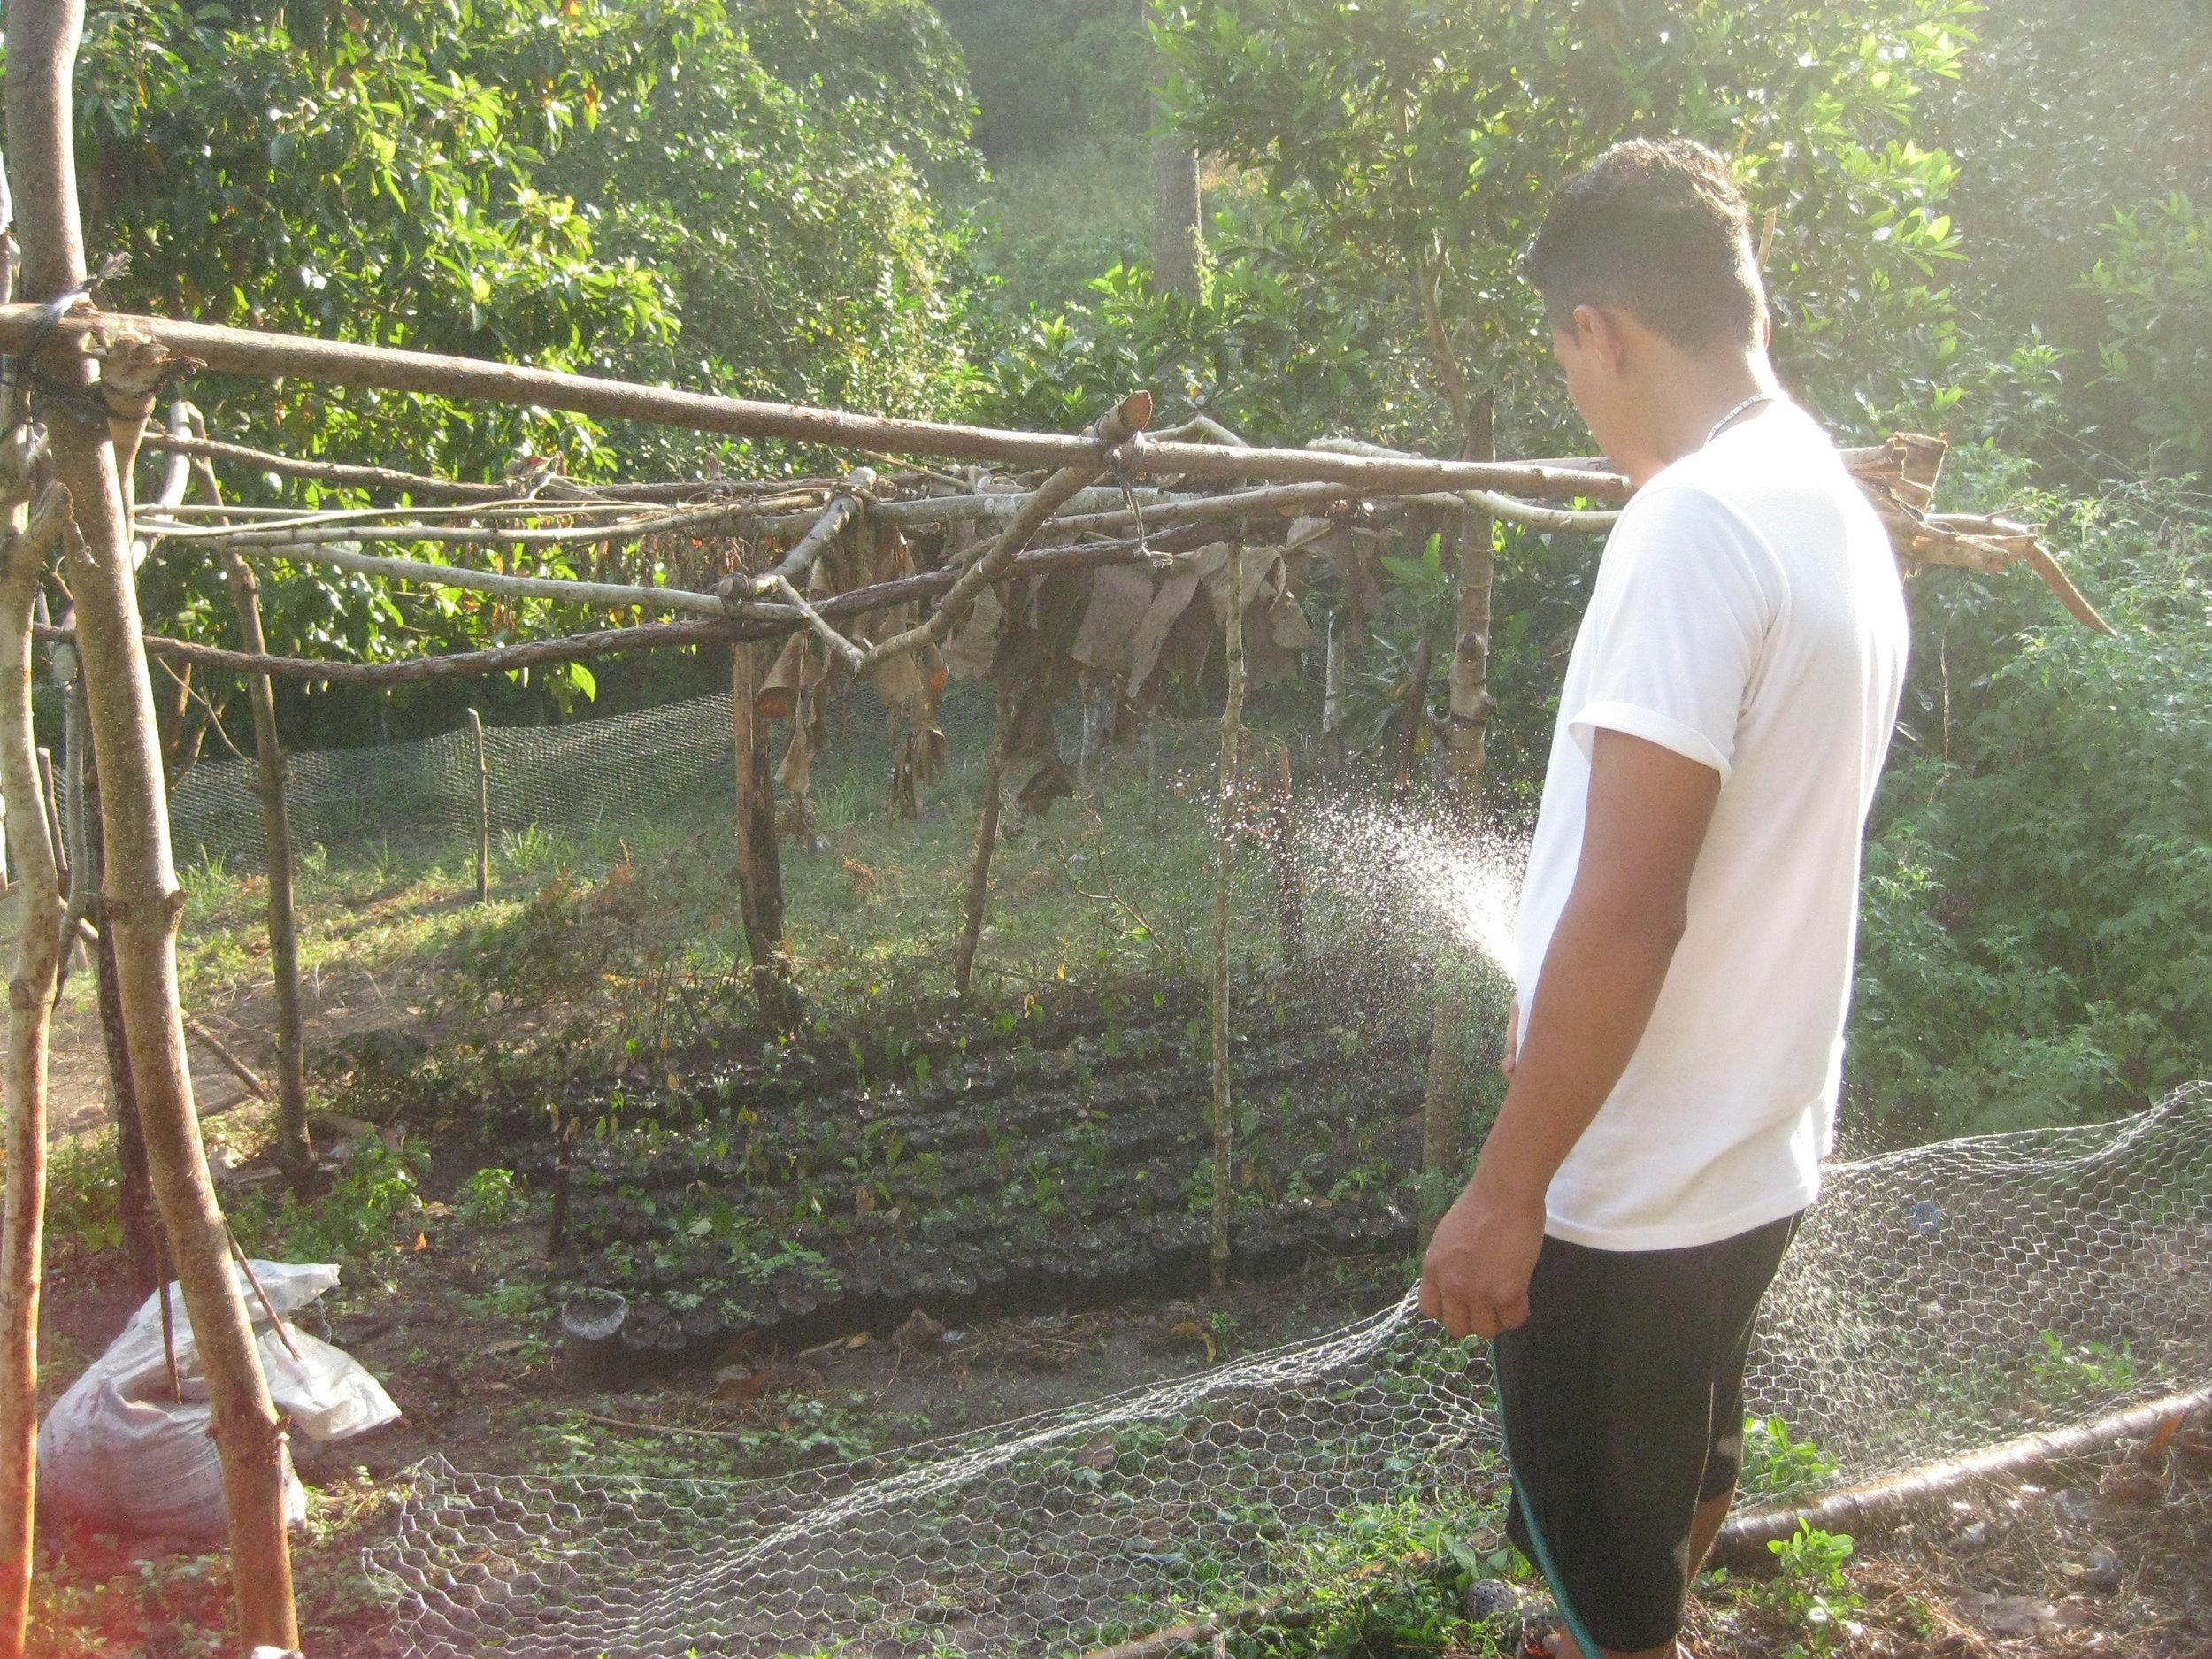 Kevin Murillo of La Majada waters a tree nursery with Masica seedlings